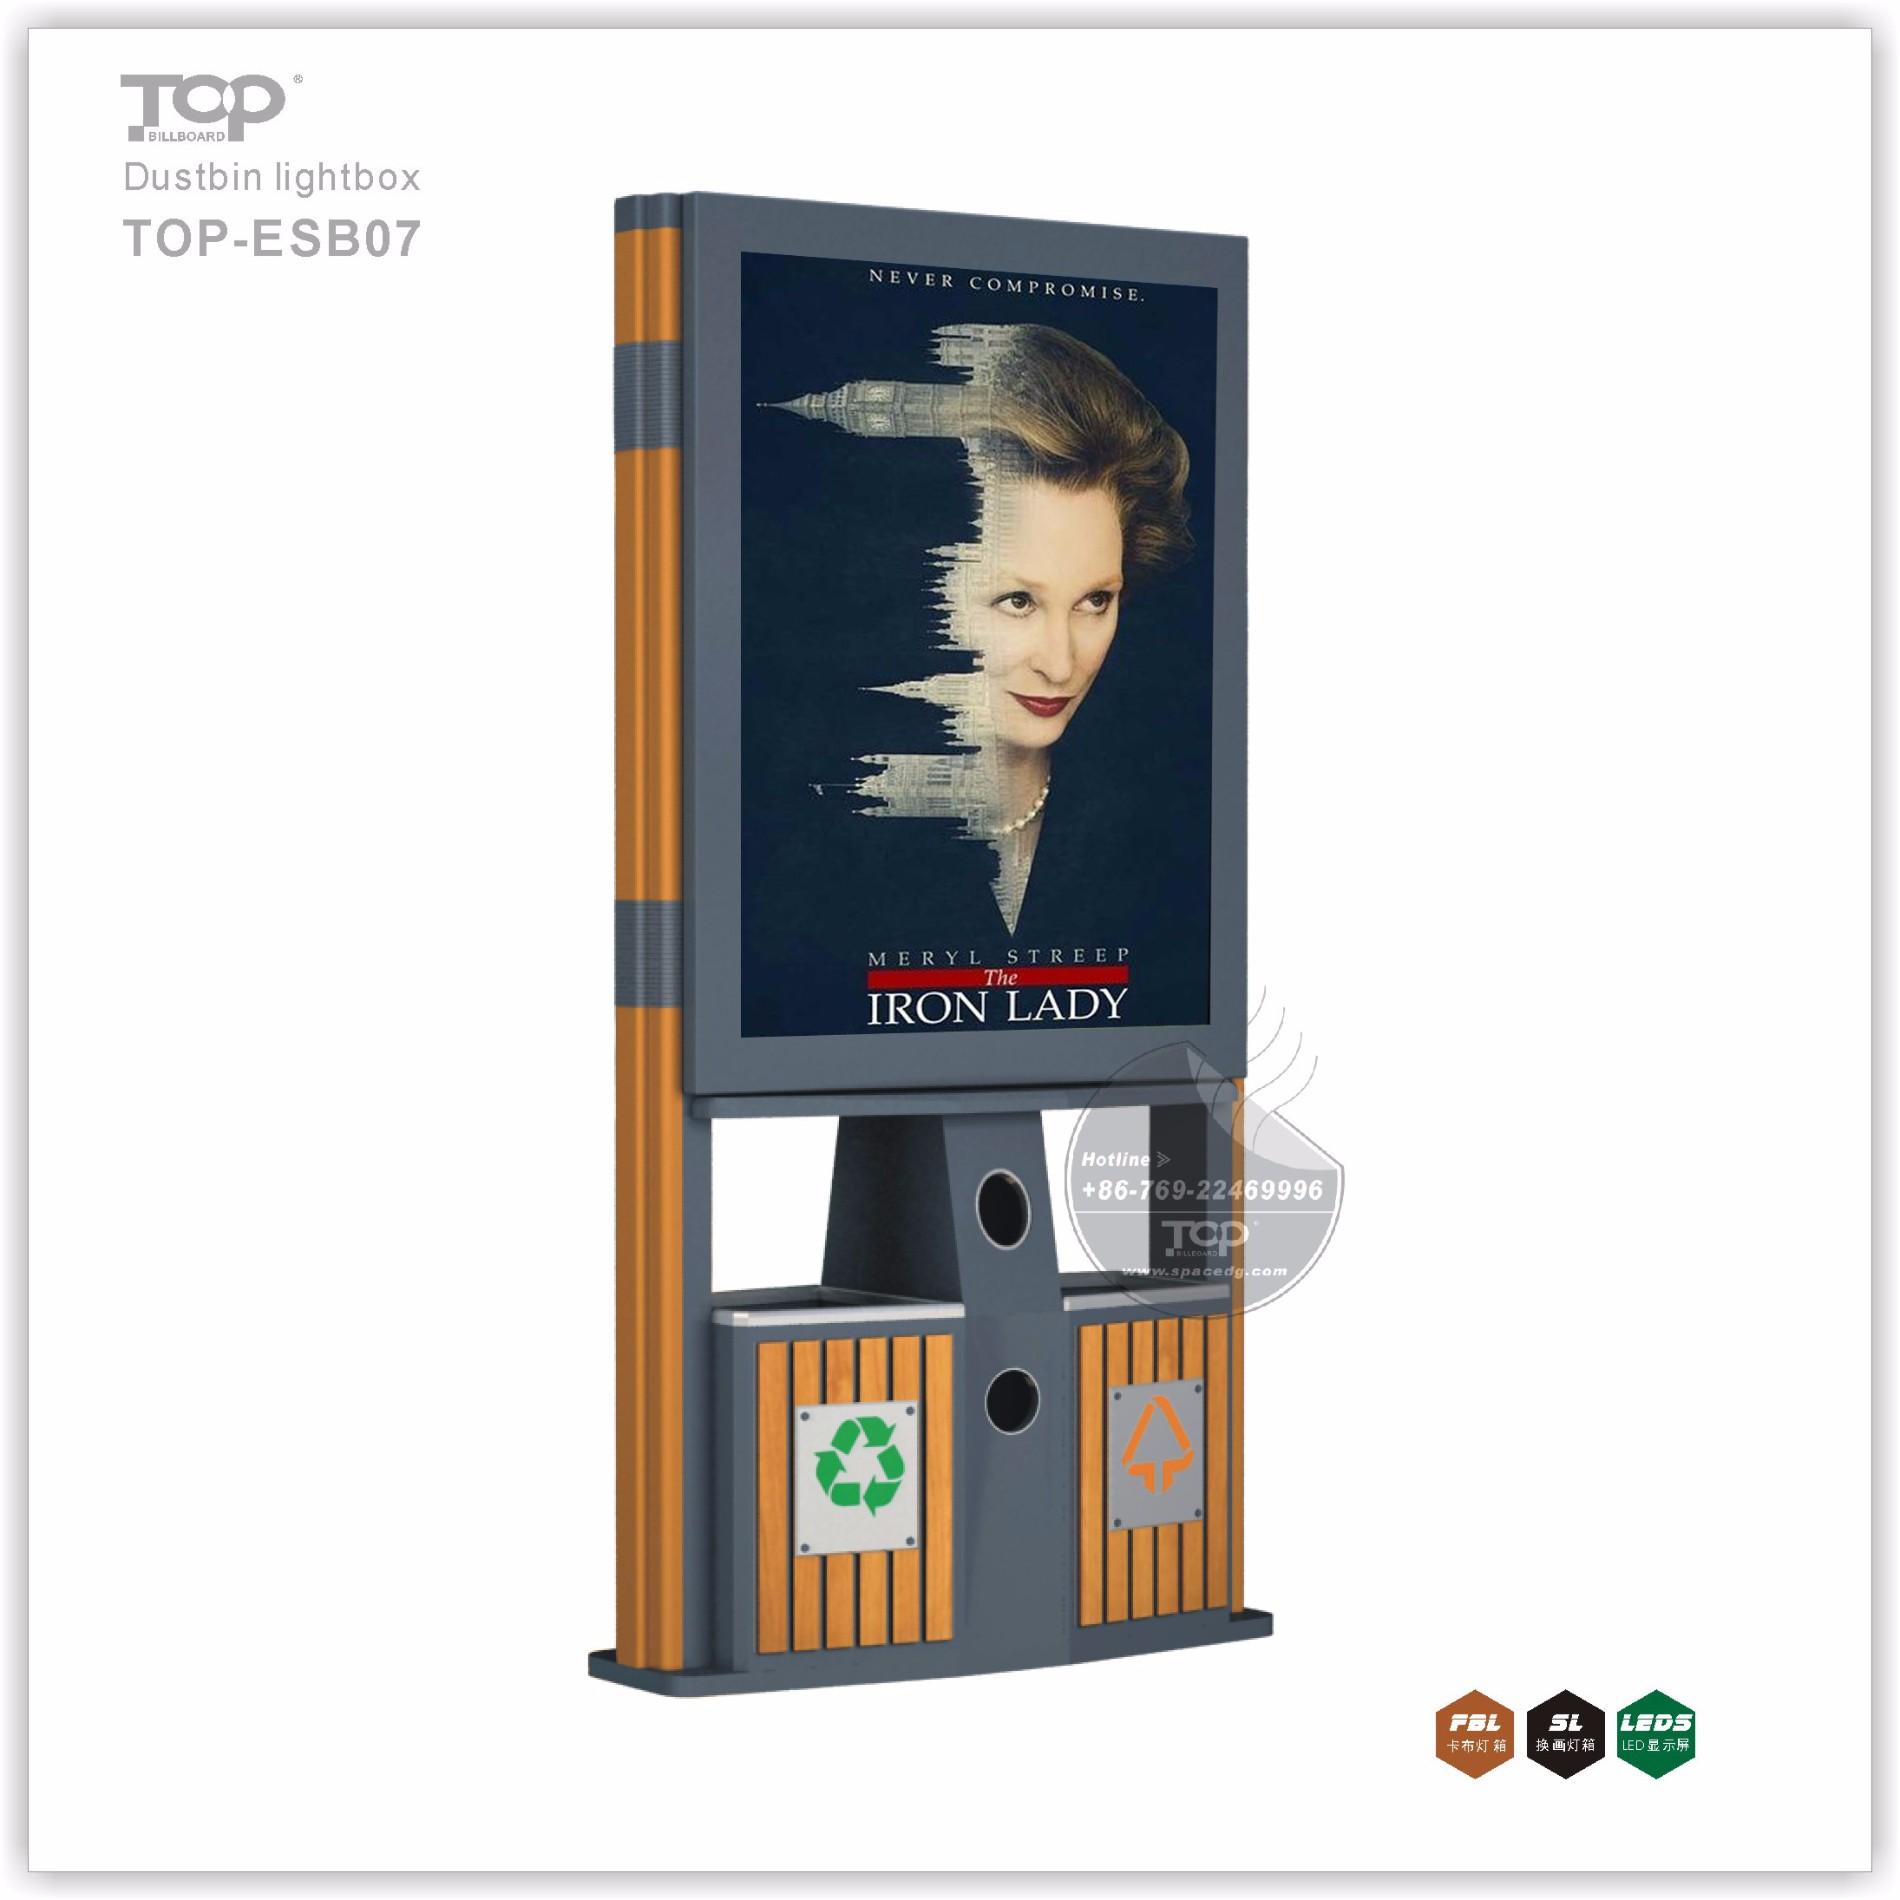 Modern Design Metal Lightbox with Dustbin